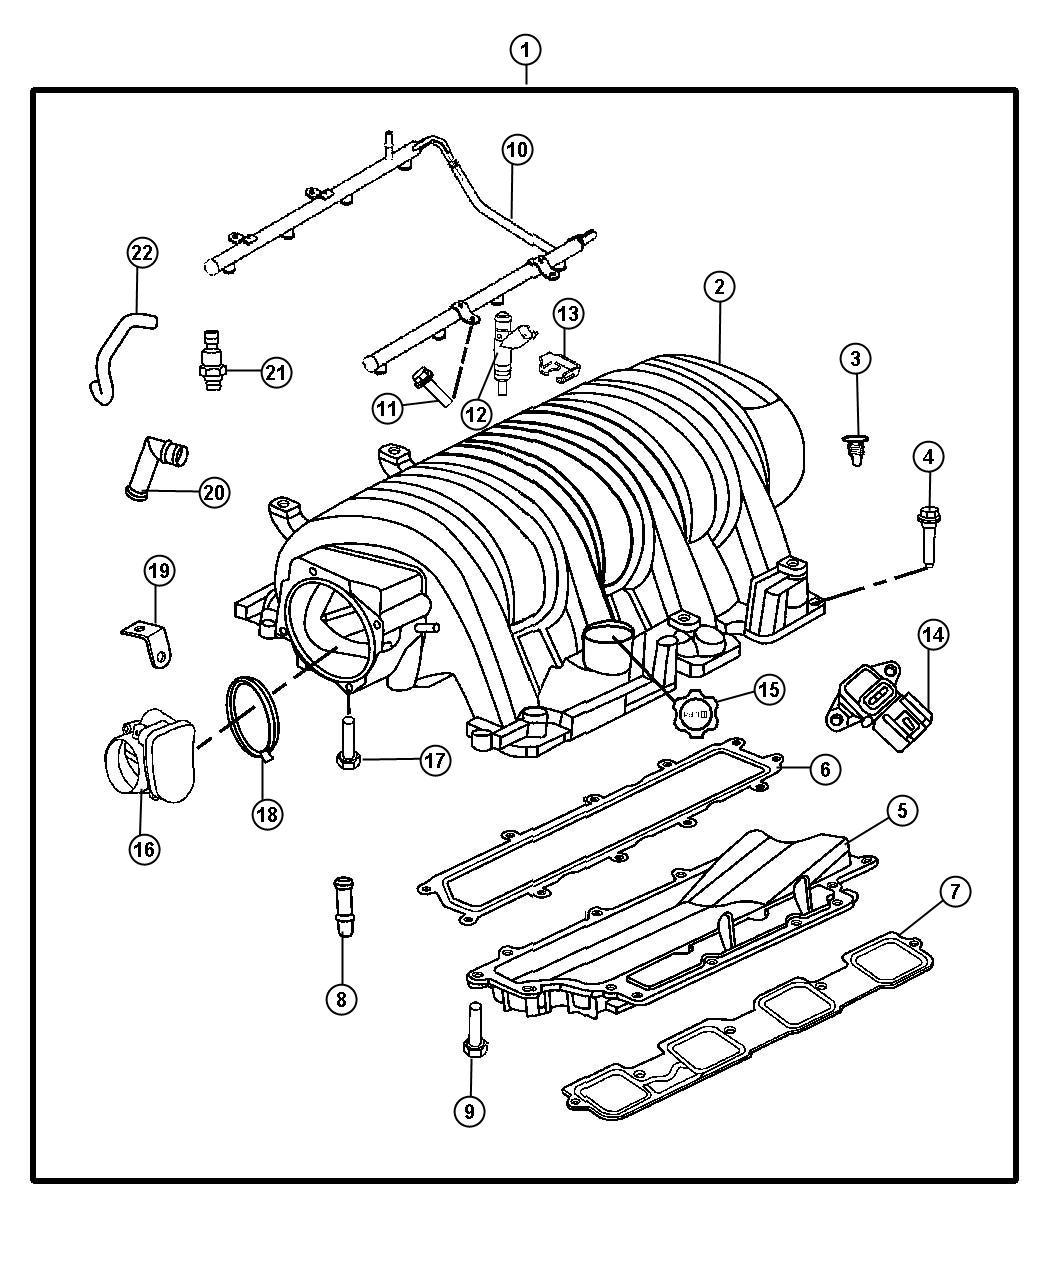 Dodge Charger Manifold Intake Engine Hemi Manifolds